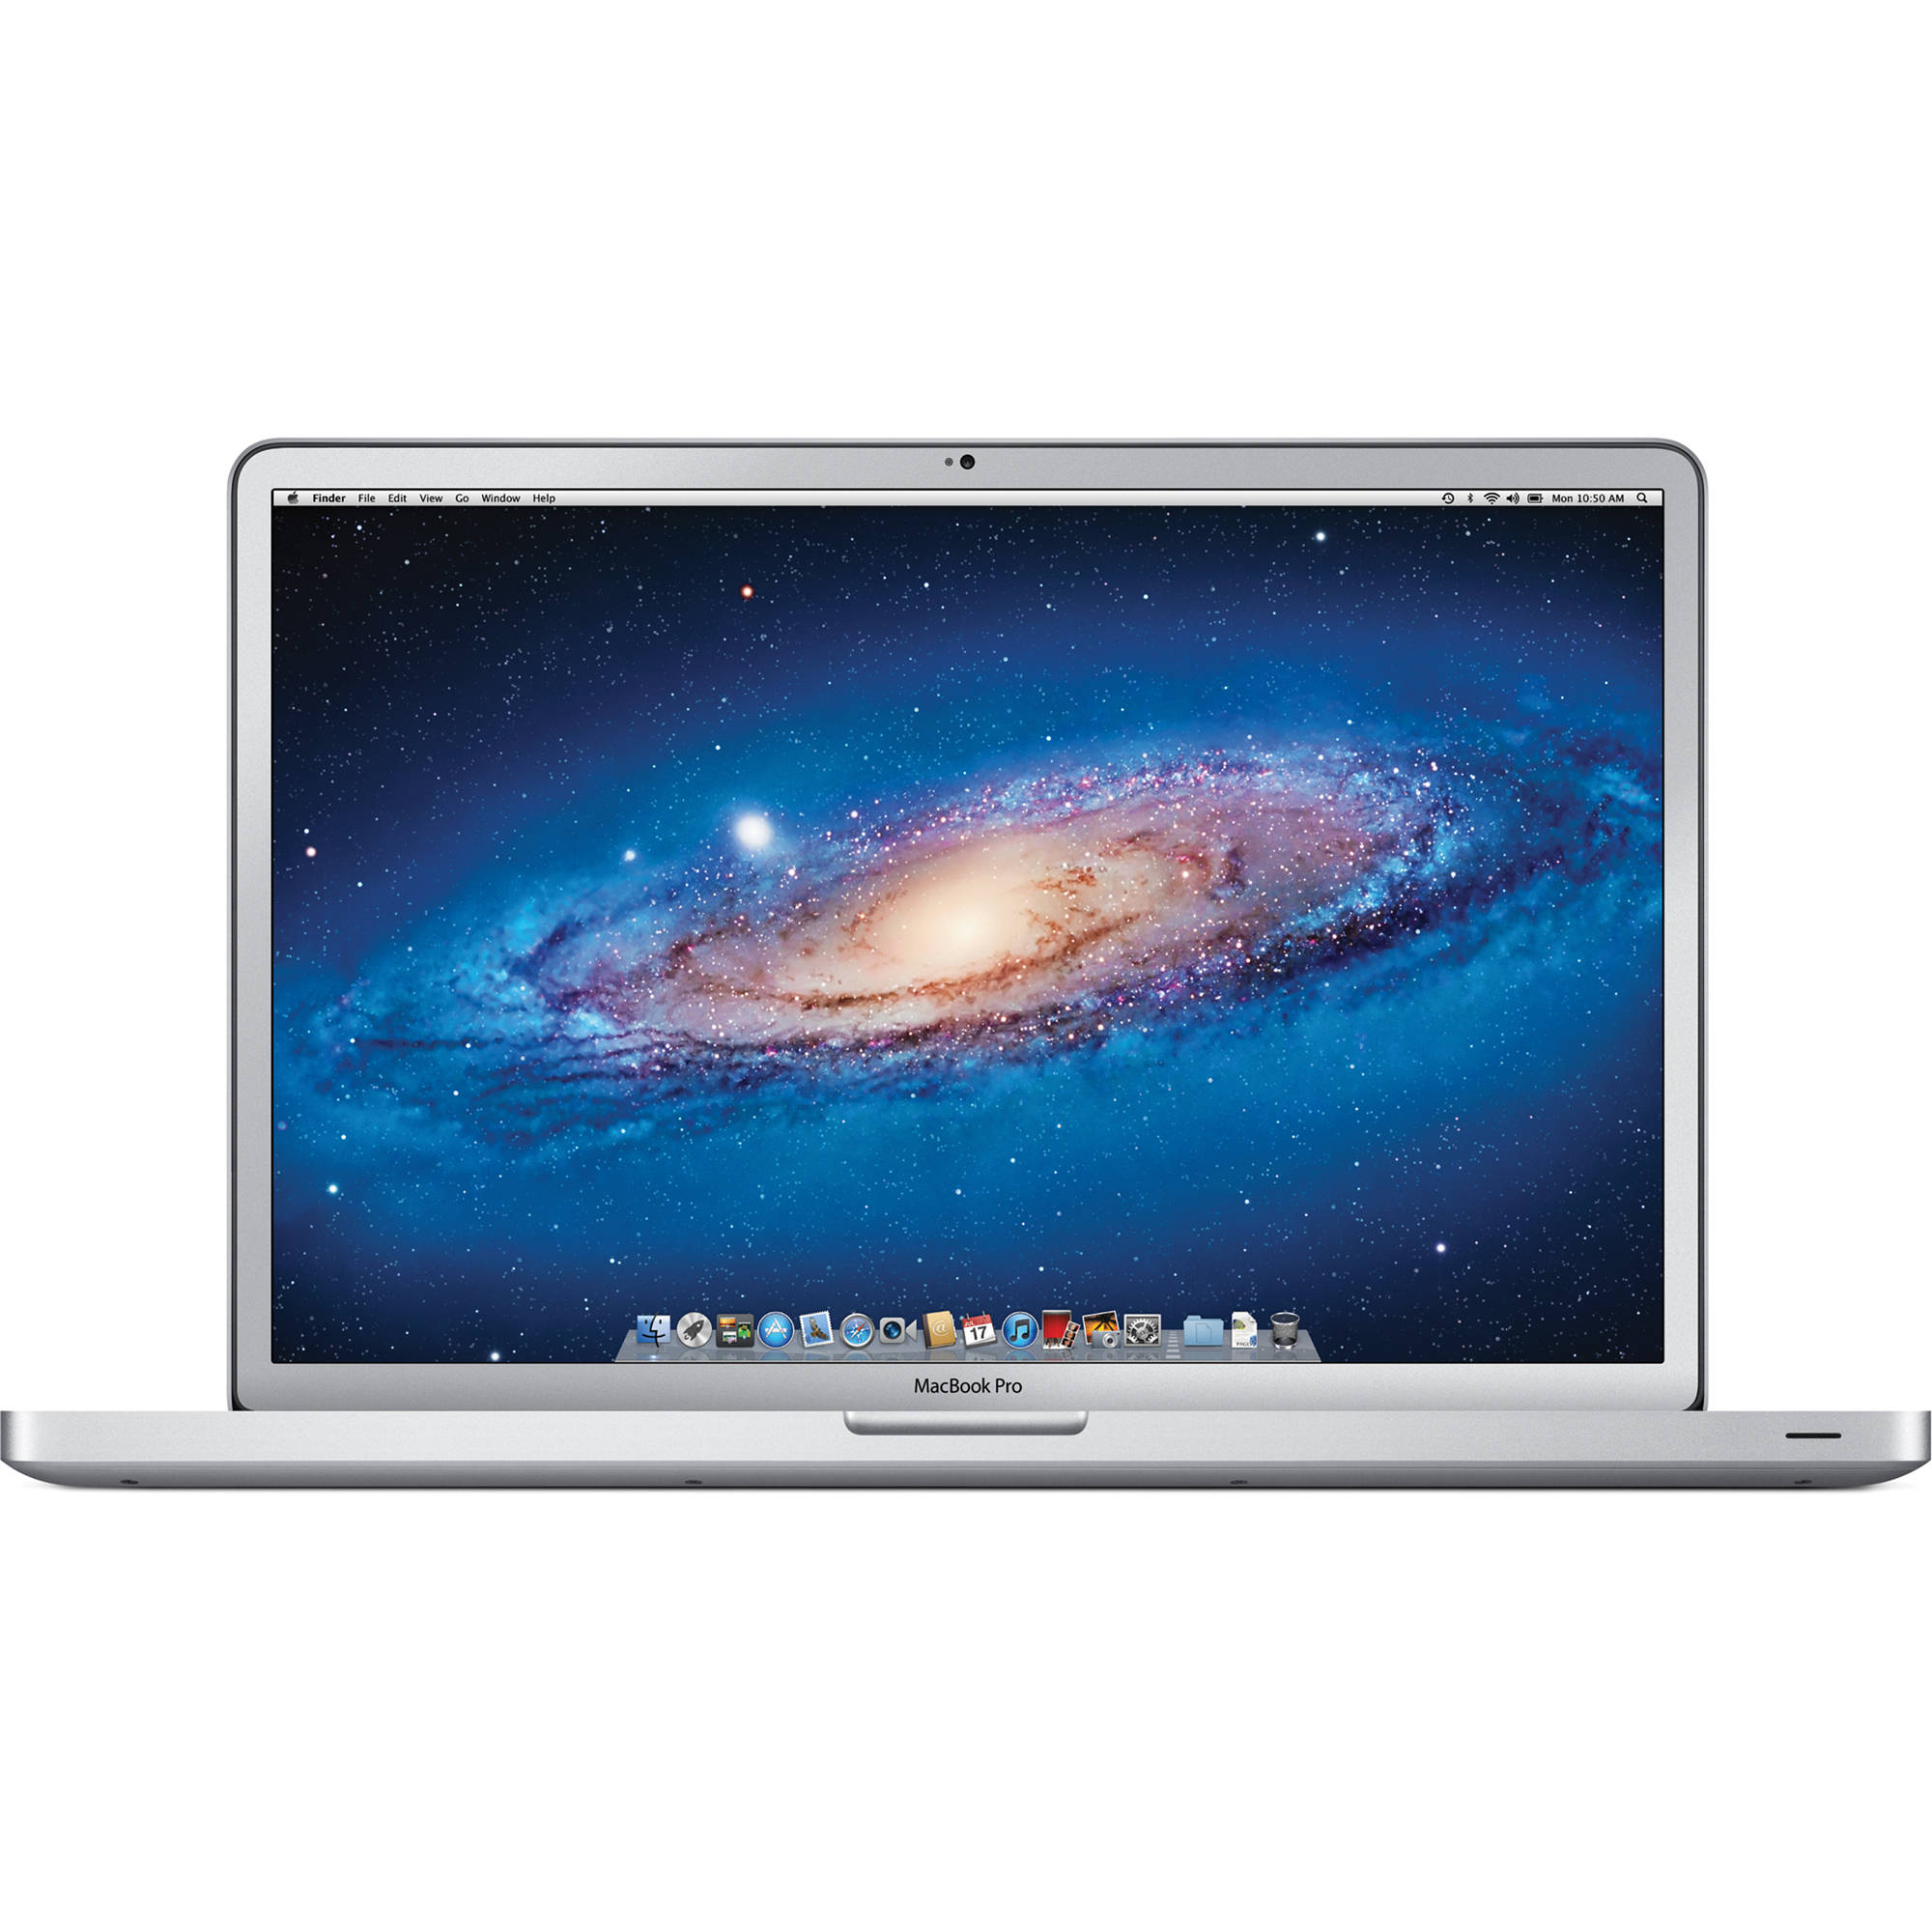 Apple 154 macbook pro notebook computer z0nl 0001 bh apple 154 macbook pro notebook computer baditri Images